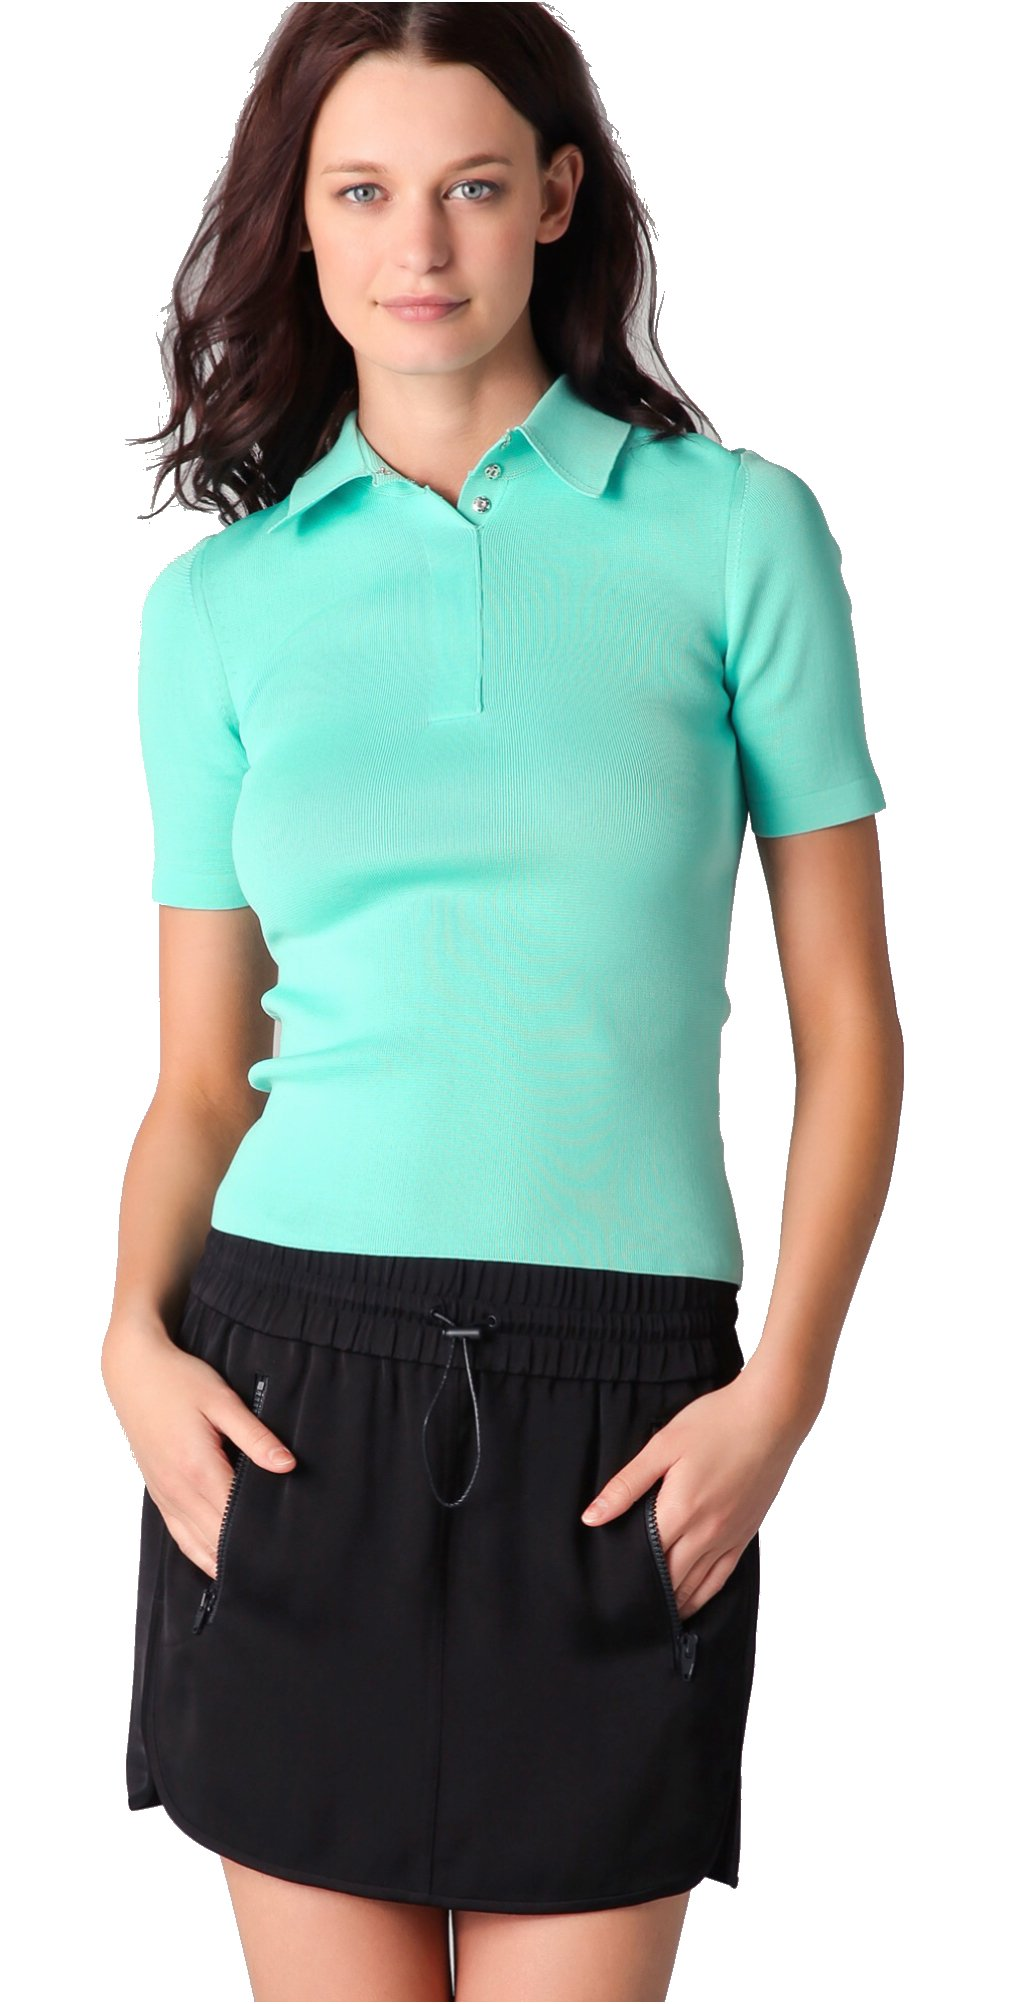 Alexander Wang Technical Short Sleeve Polo (Medium, Aqua)